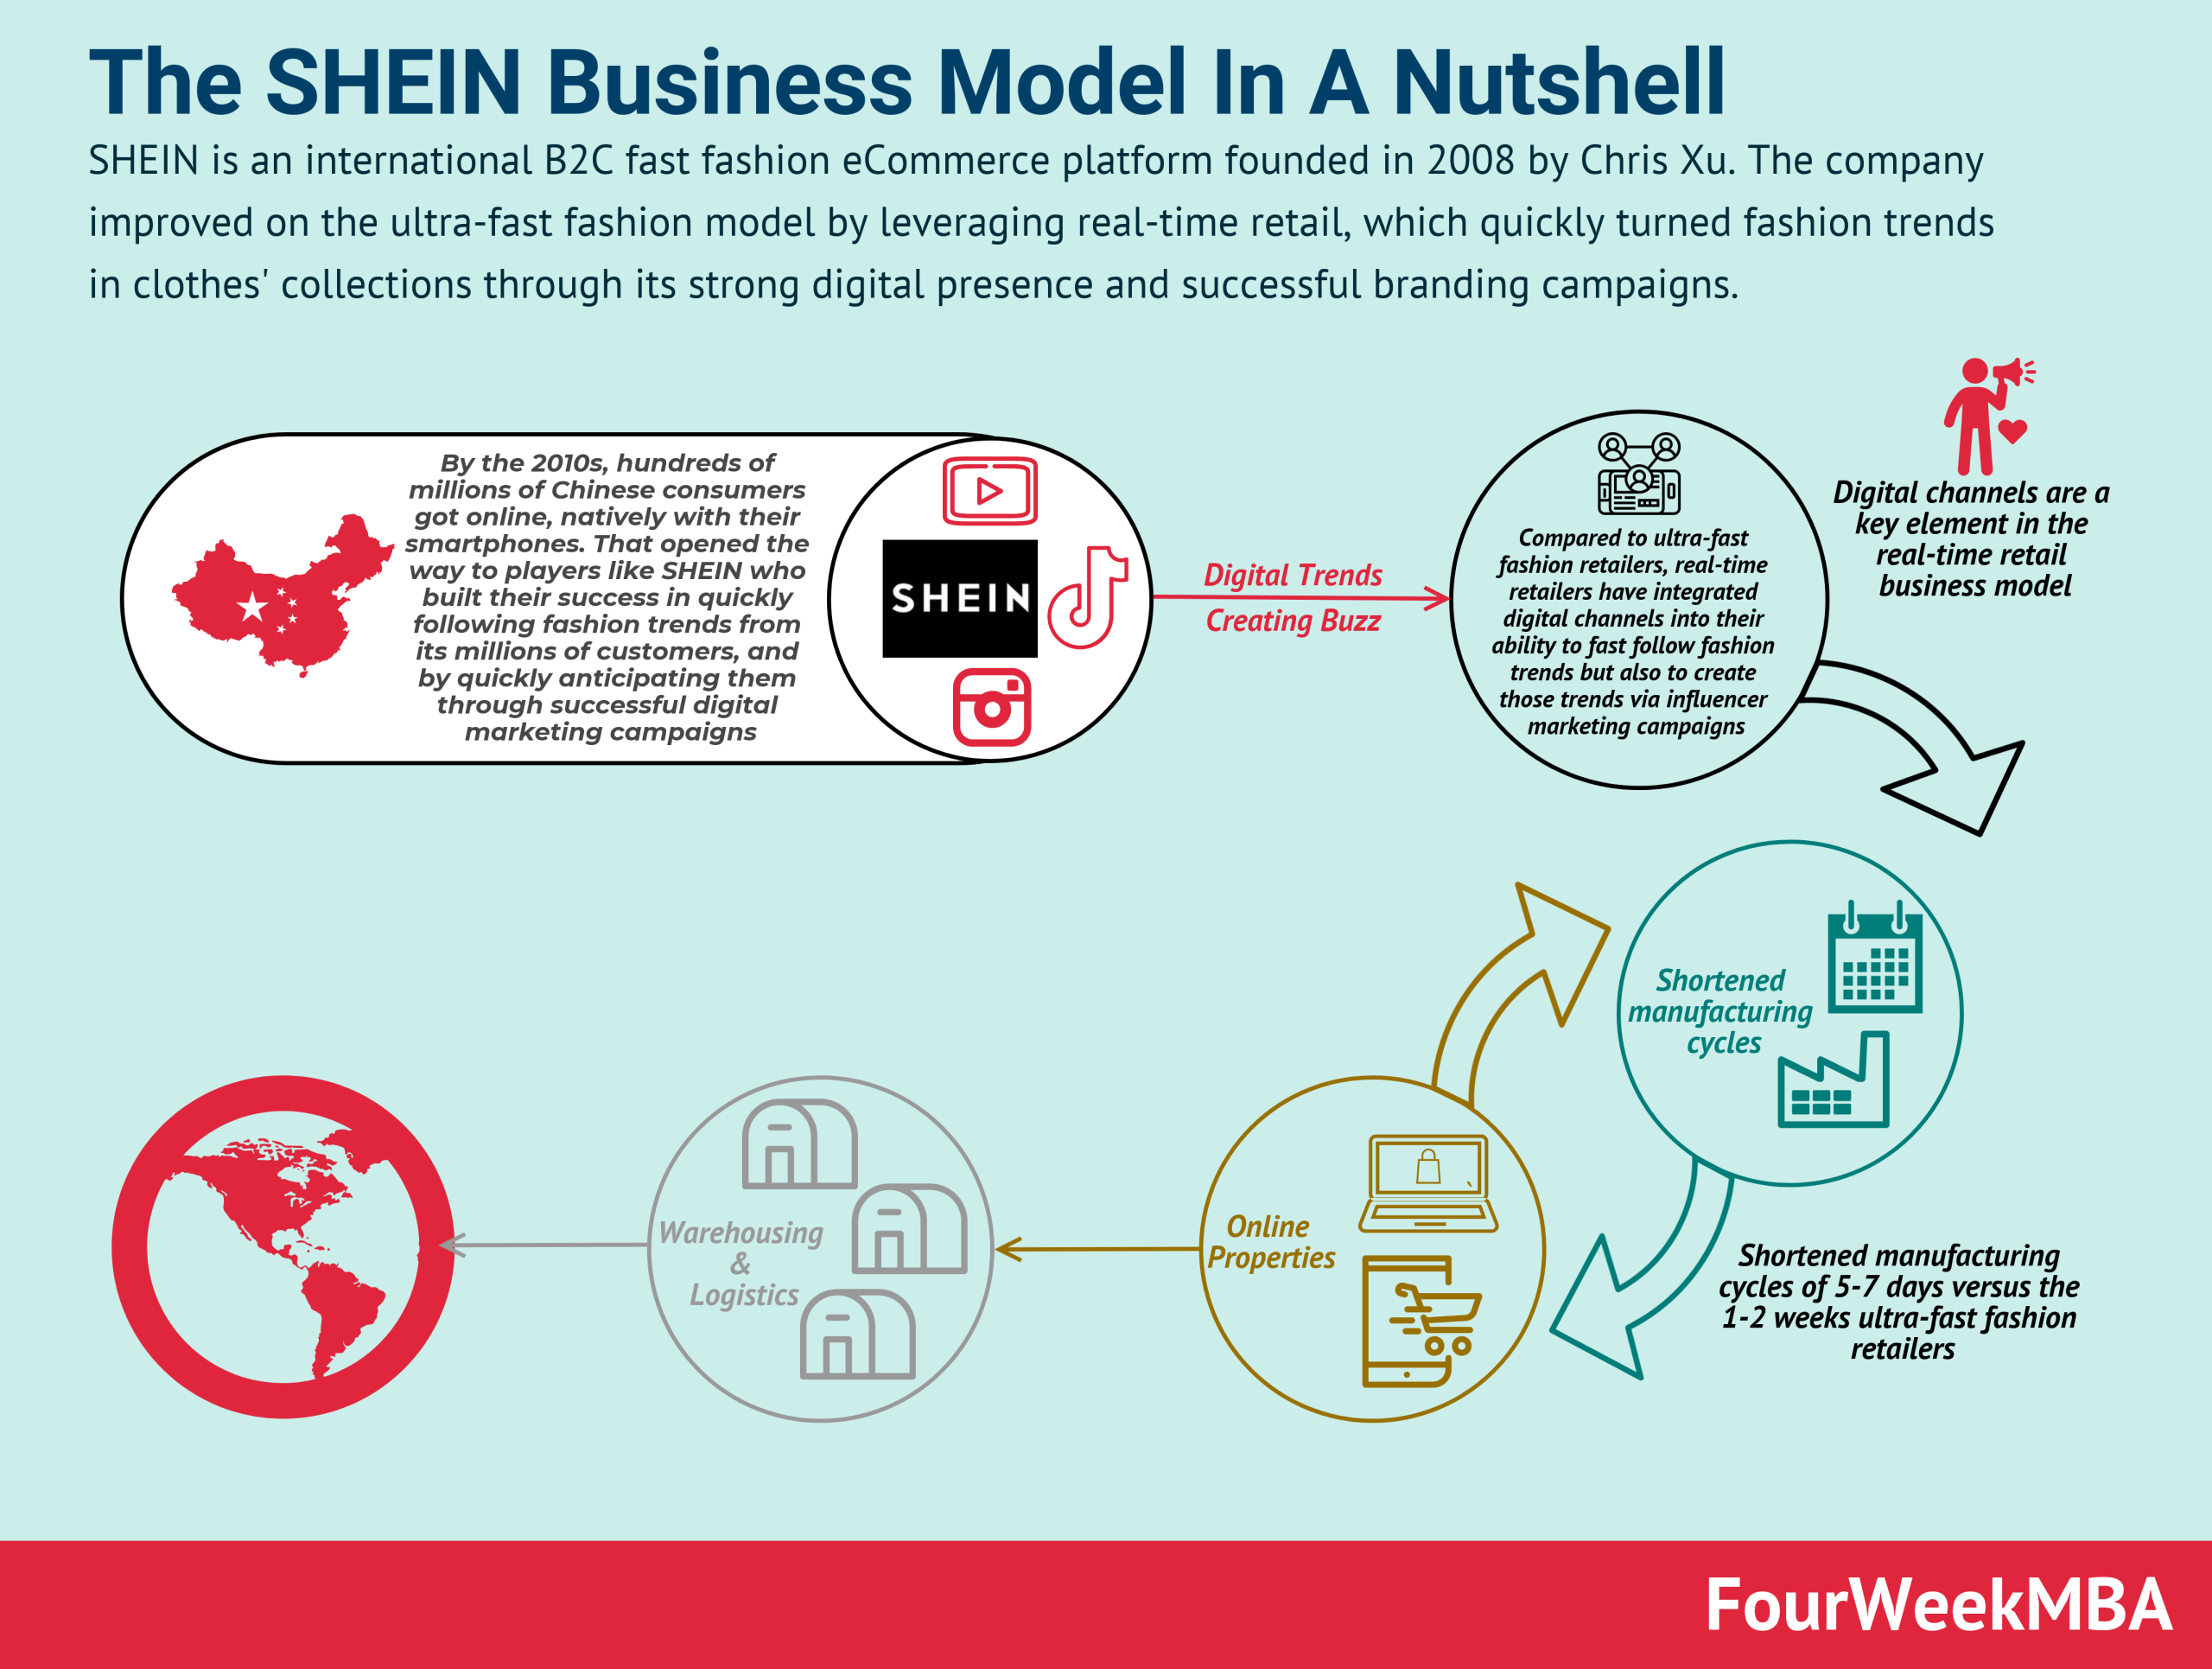 shein-business-model